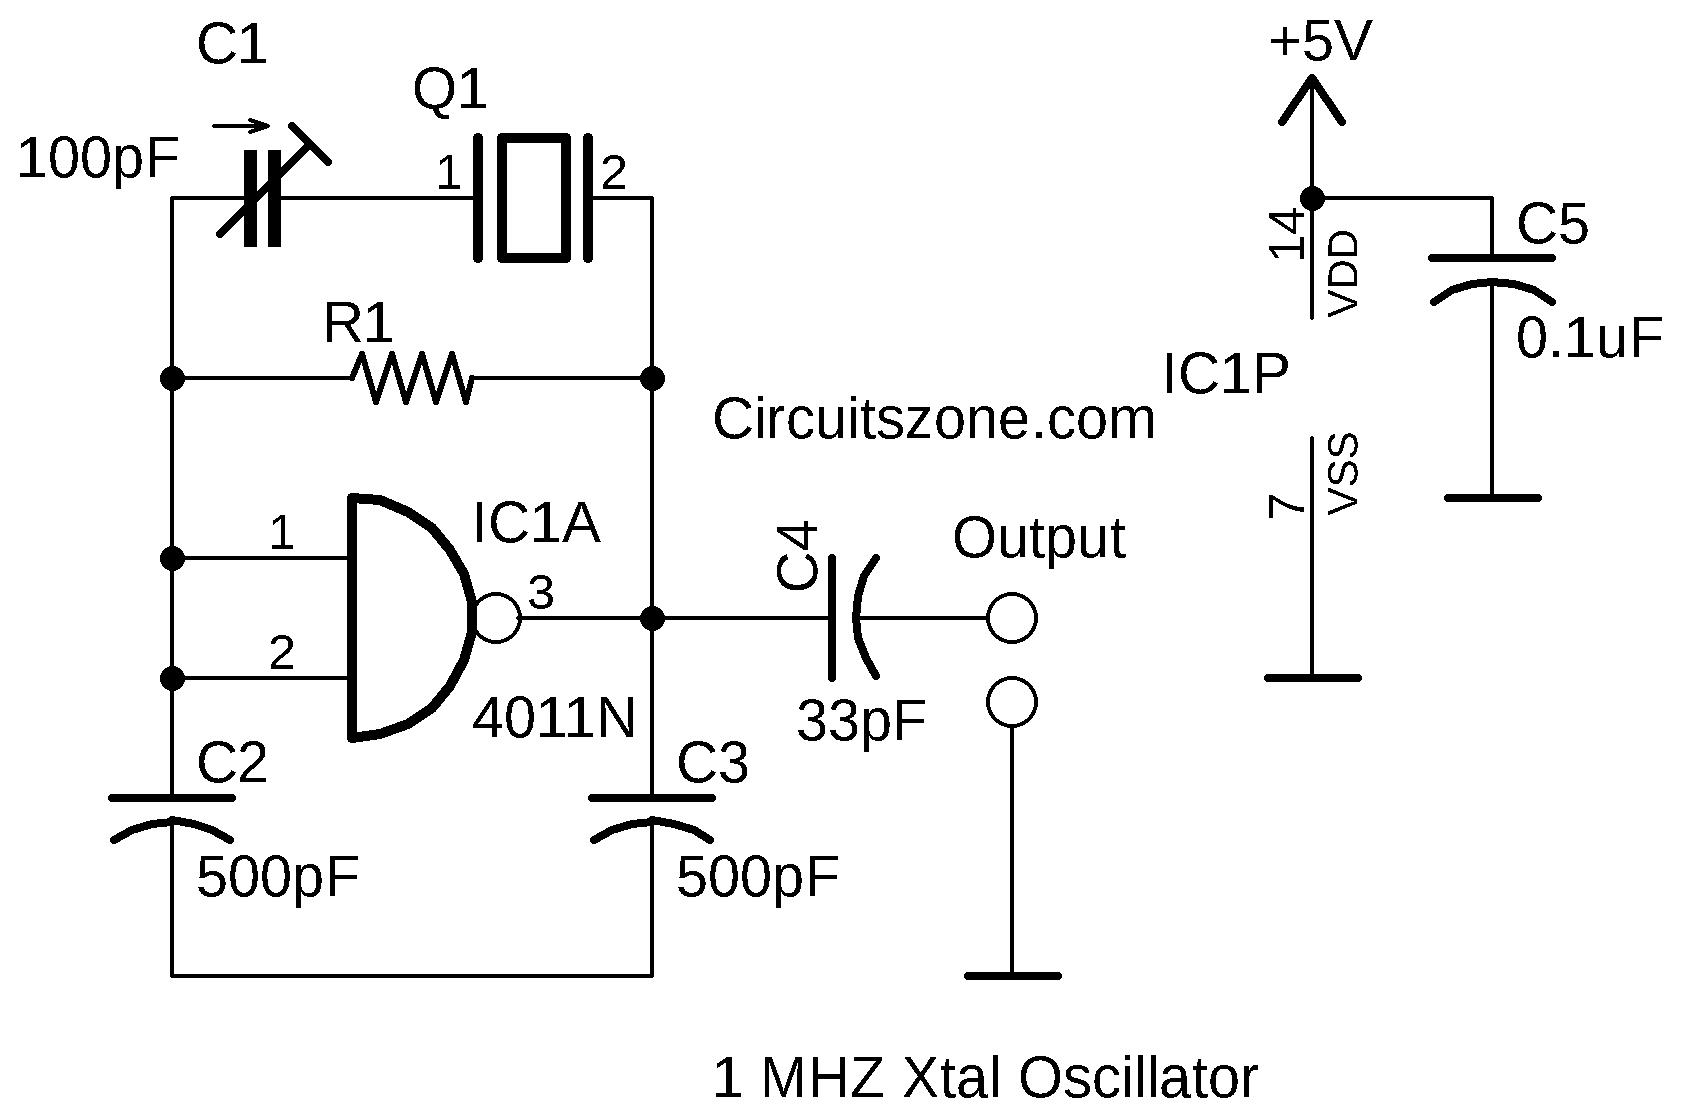 1 mhz xtal oscillator based cmos